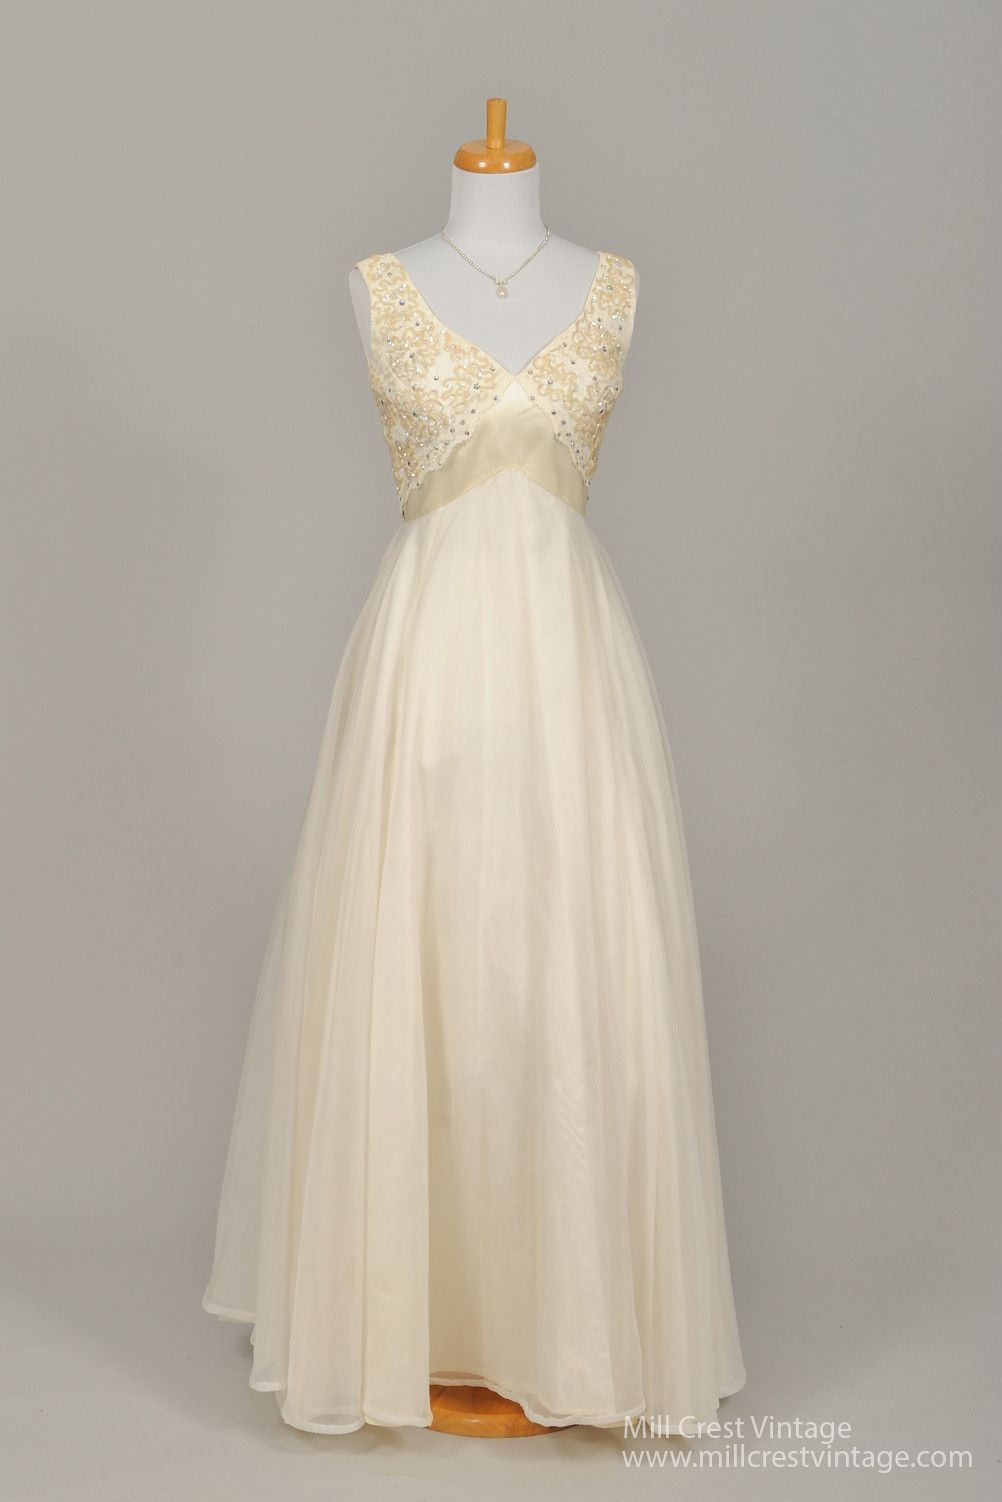 1960 wedding dresses   Emma Domb Jeweled Vintage Wedding Gown  Pinterest  Vintage